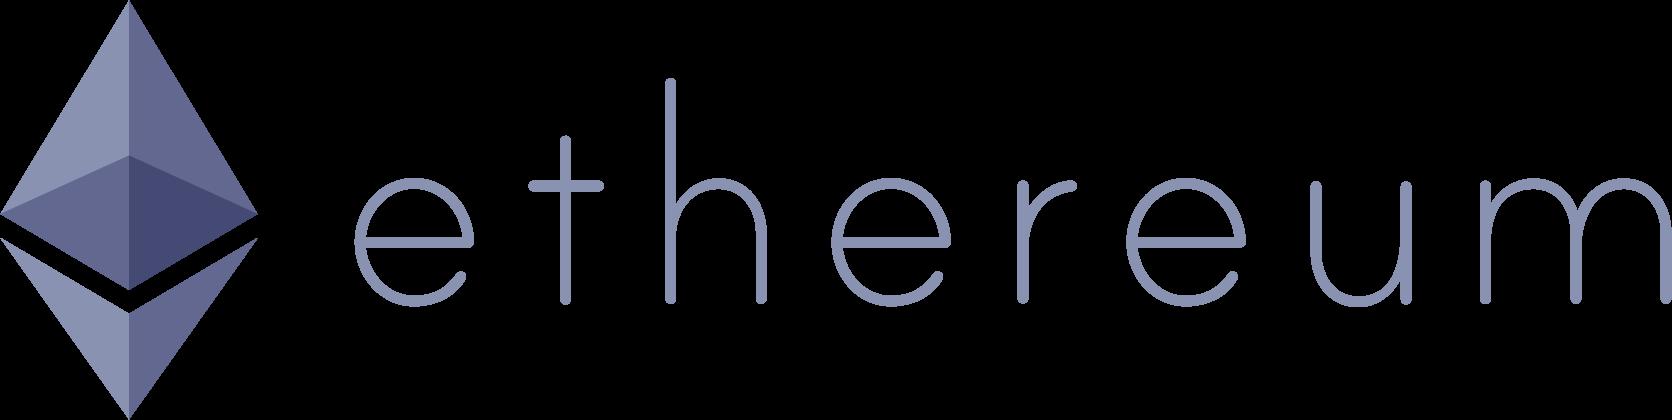 Ethereum nav bar logo